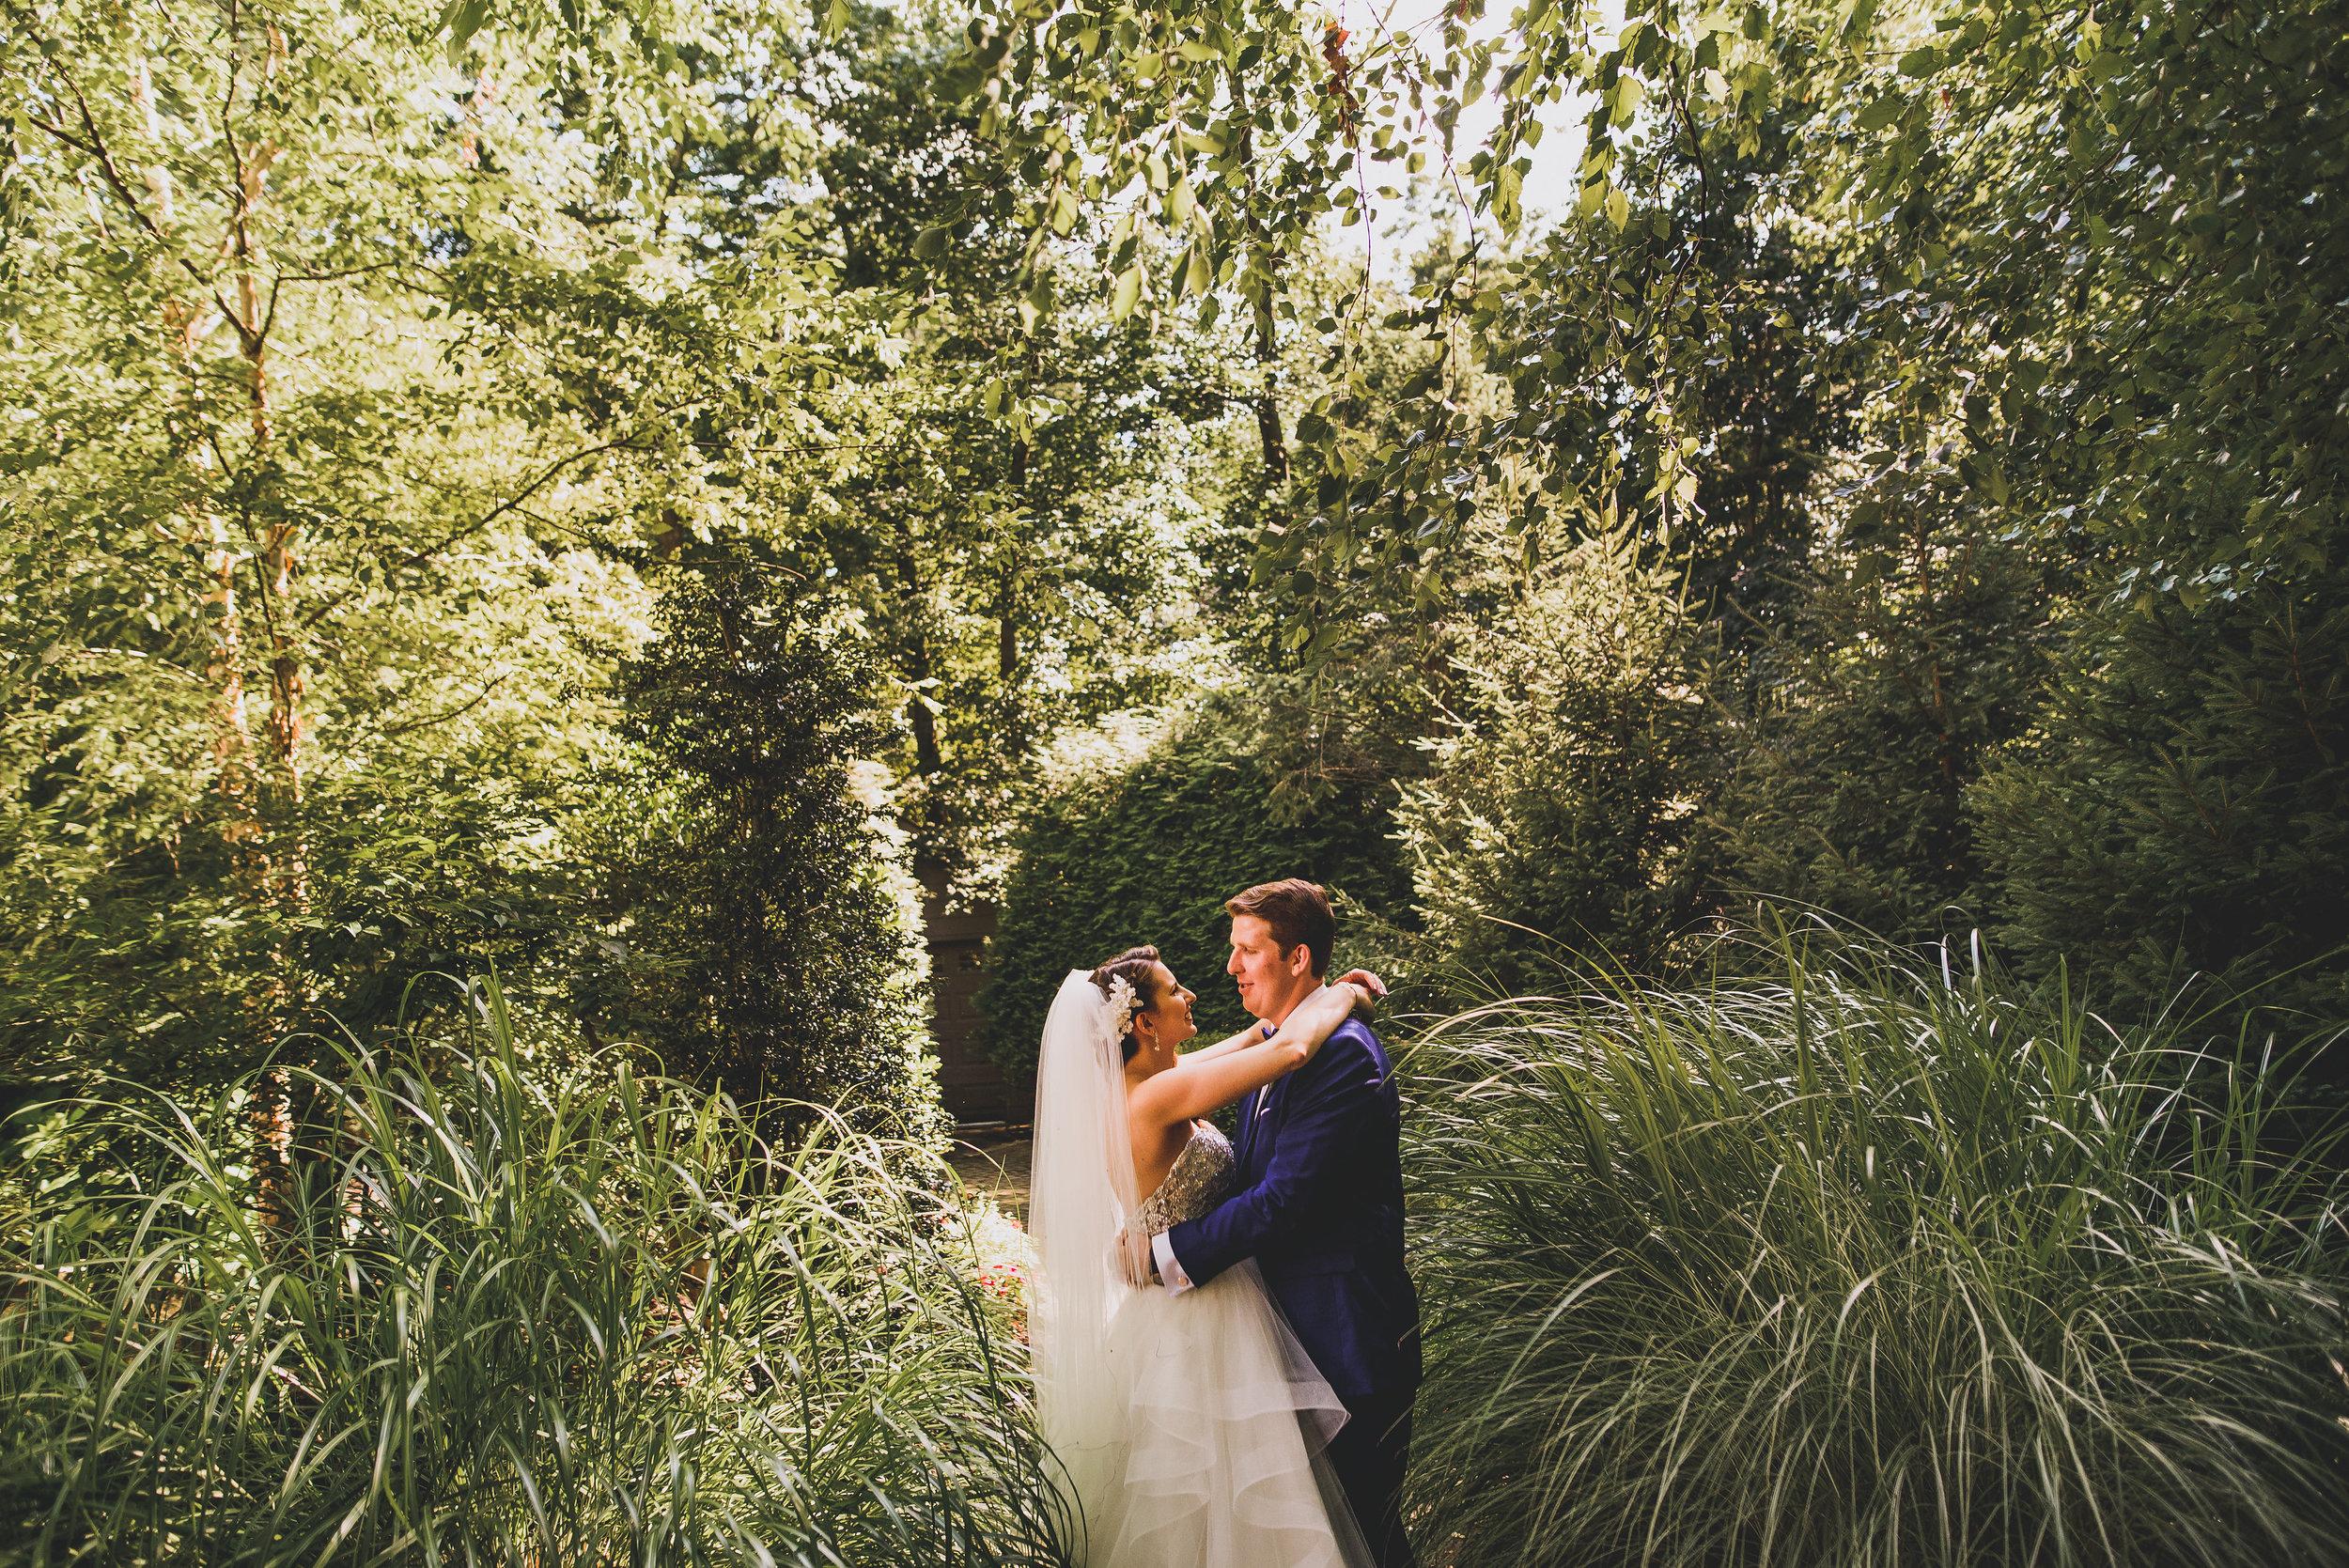 Elise-Ben-Wedding-245.jpg